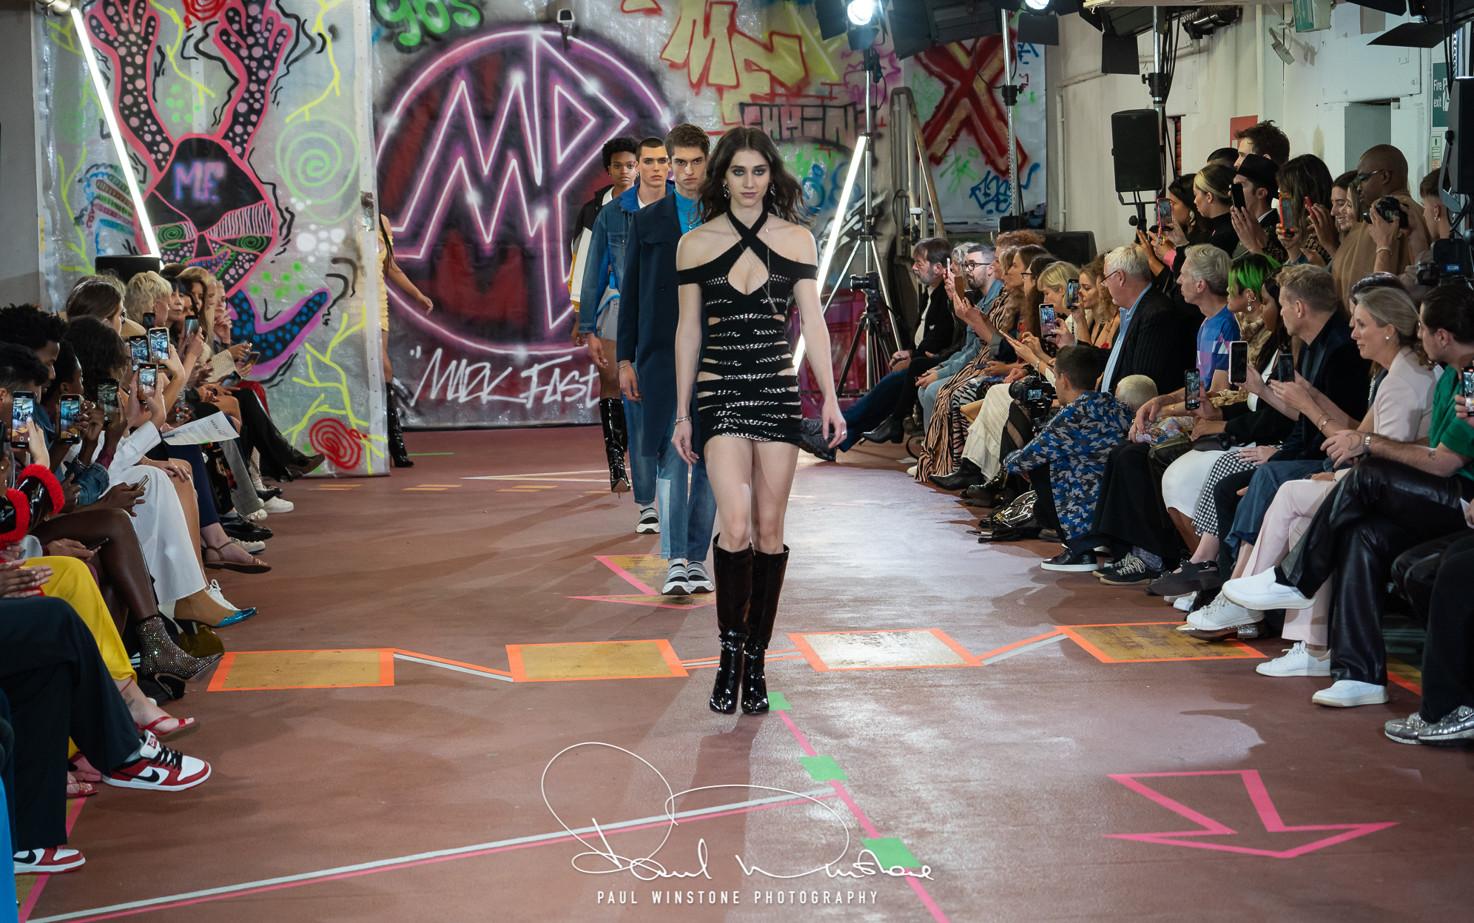 Mark fast ss22 during london fashion week (9)